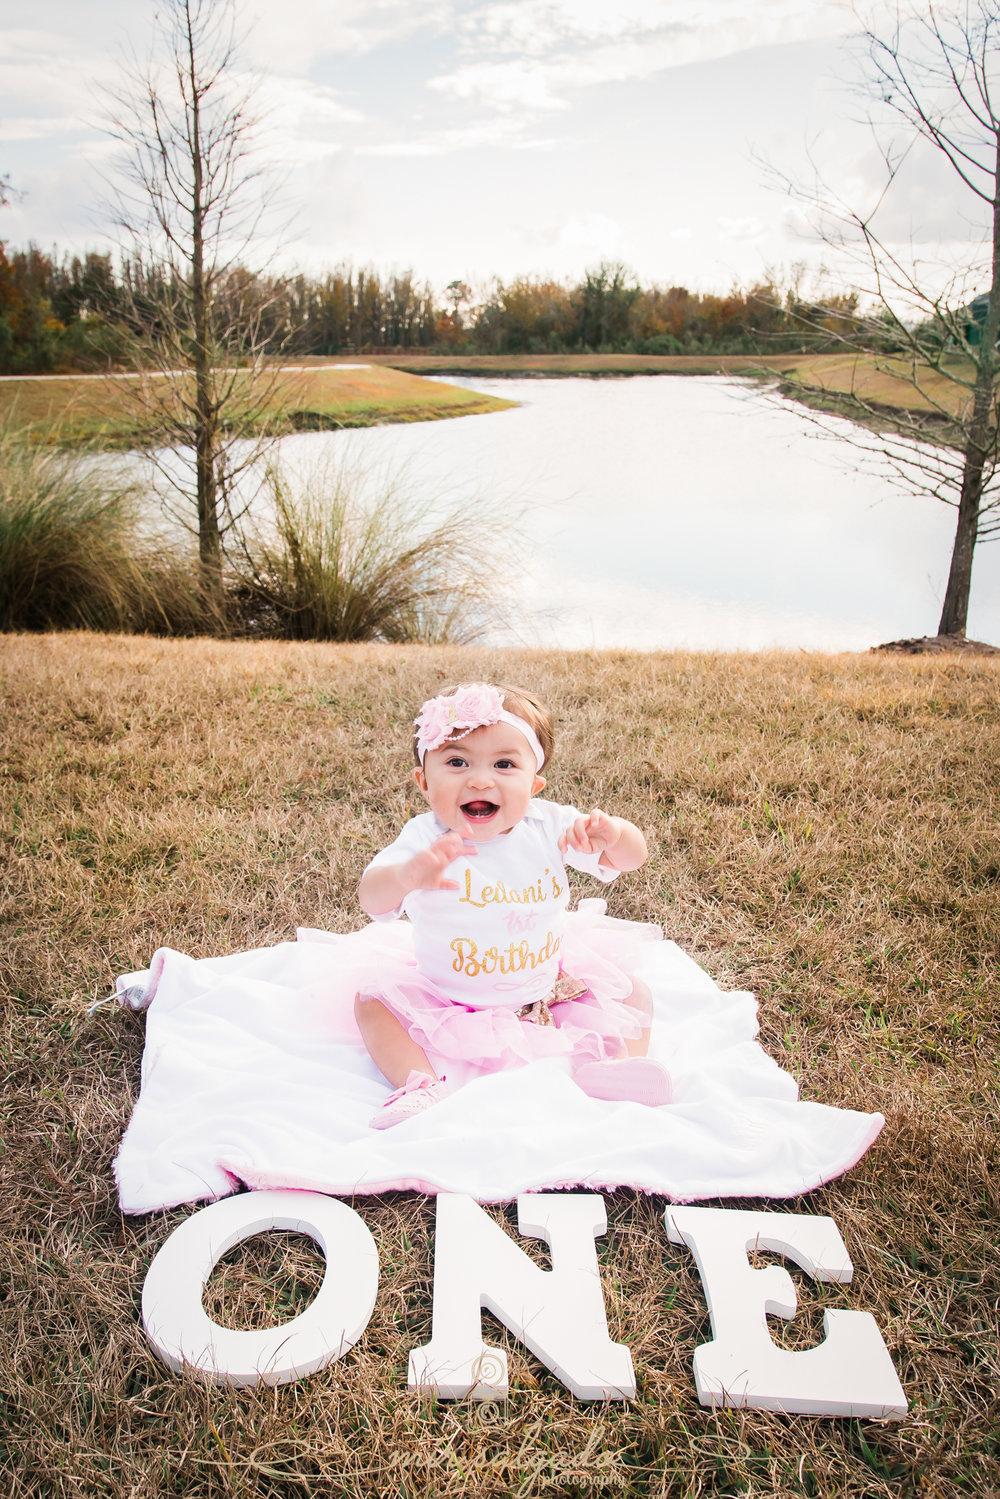 Tampa-baby-photo, Tampa-photographer